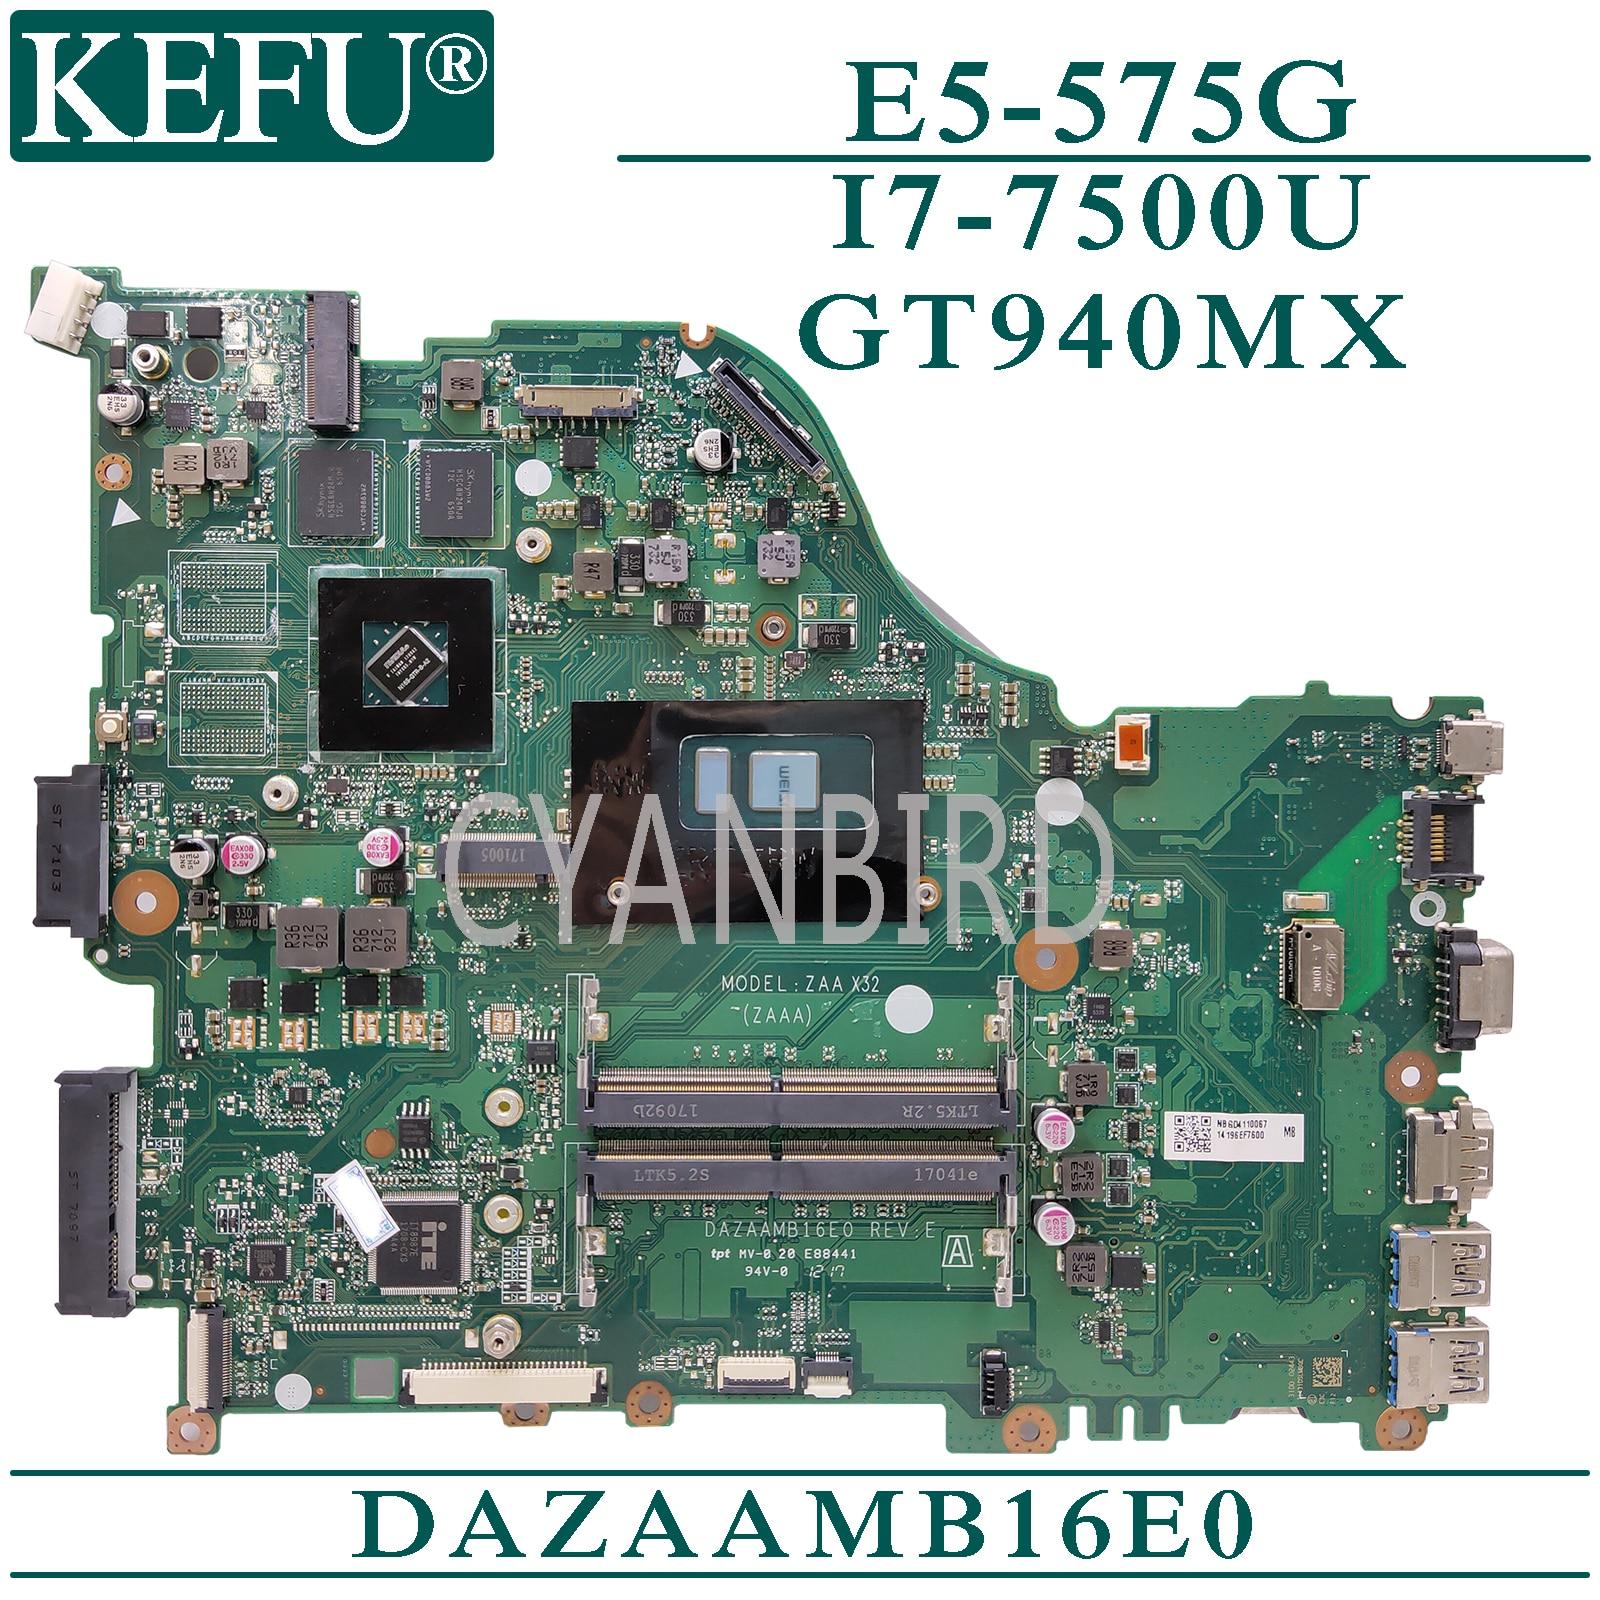 KEFU DAZAAMB16E0 original mainboard for Acer Aspire E5-575G with I7-7500U GT940MX Laptop motherboard